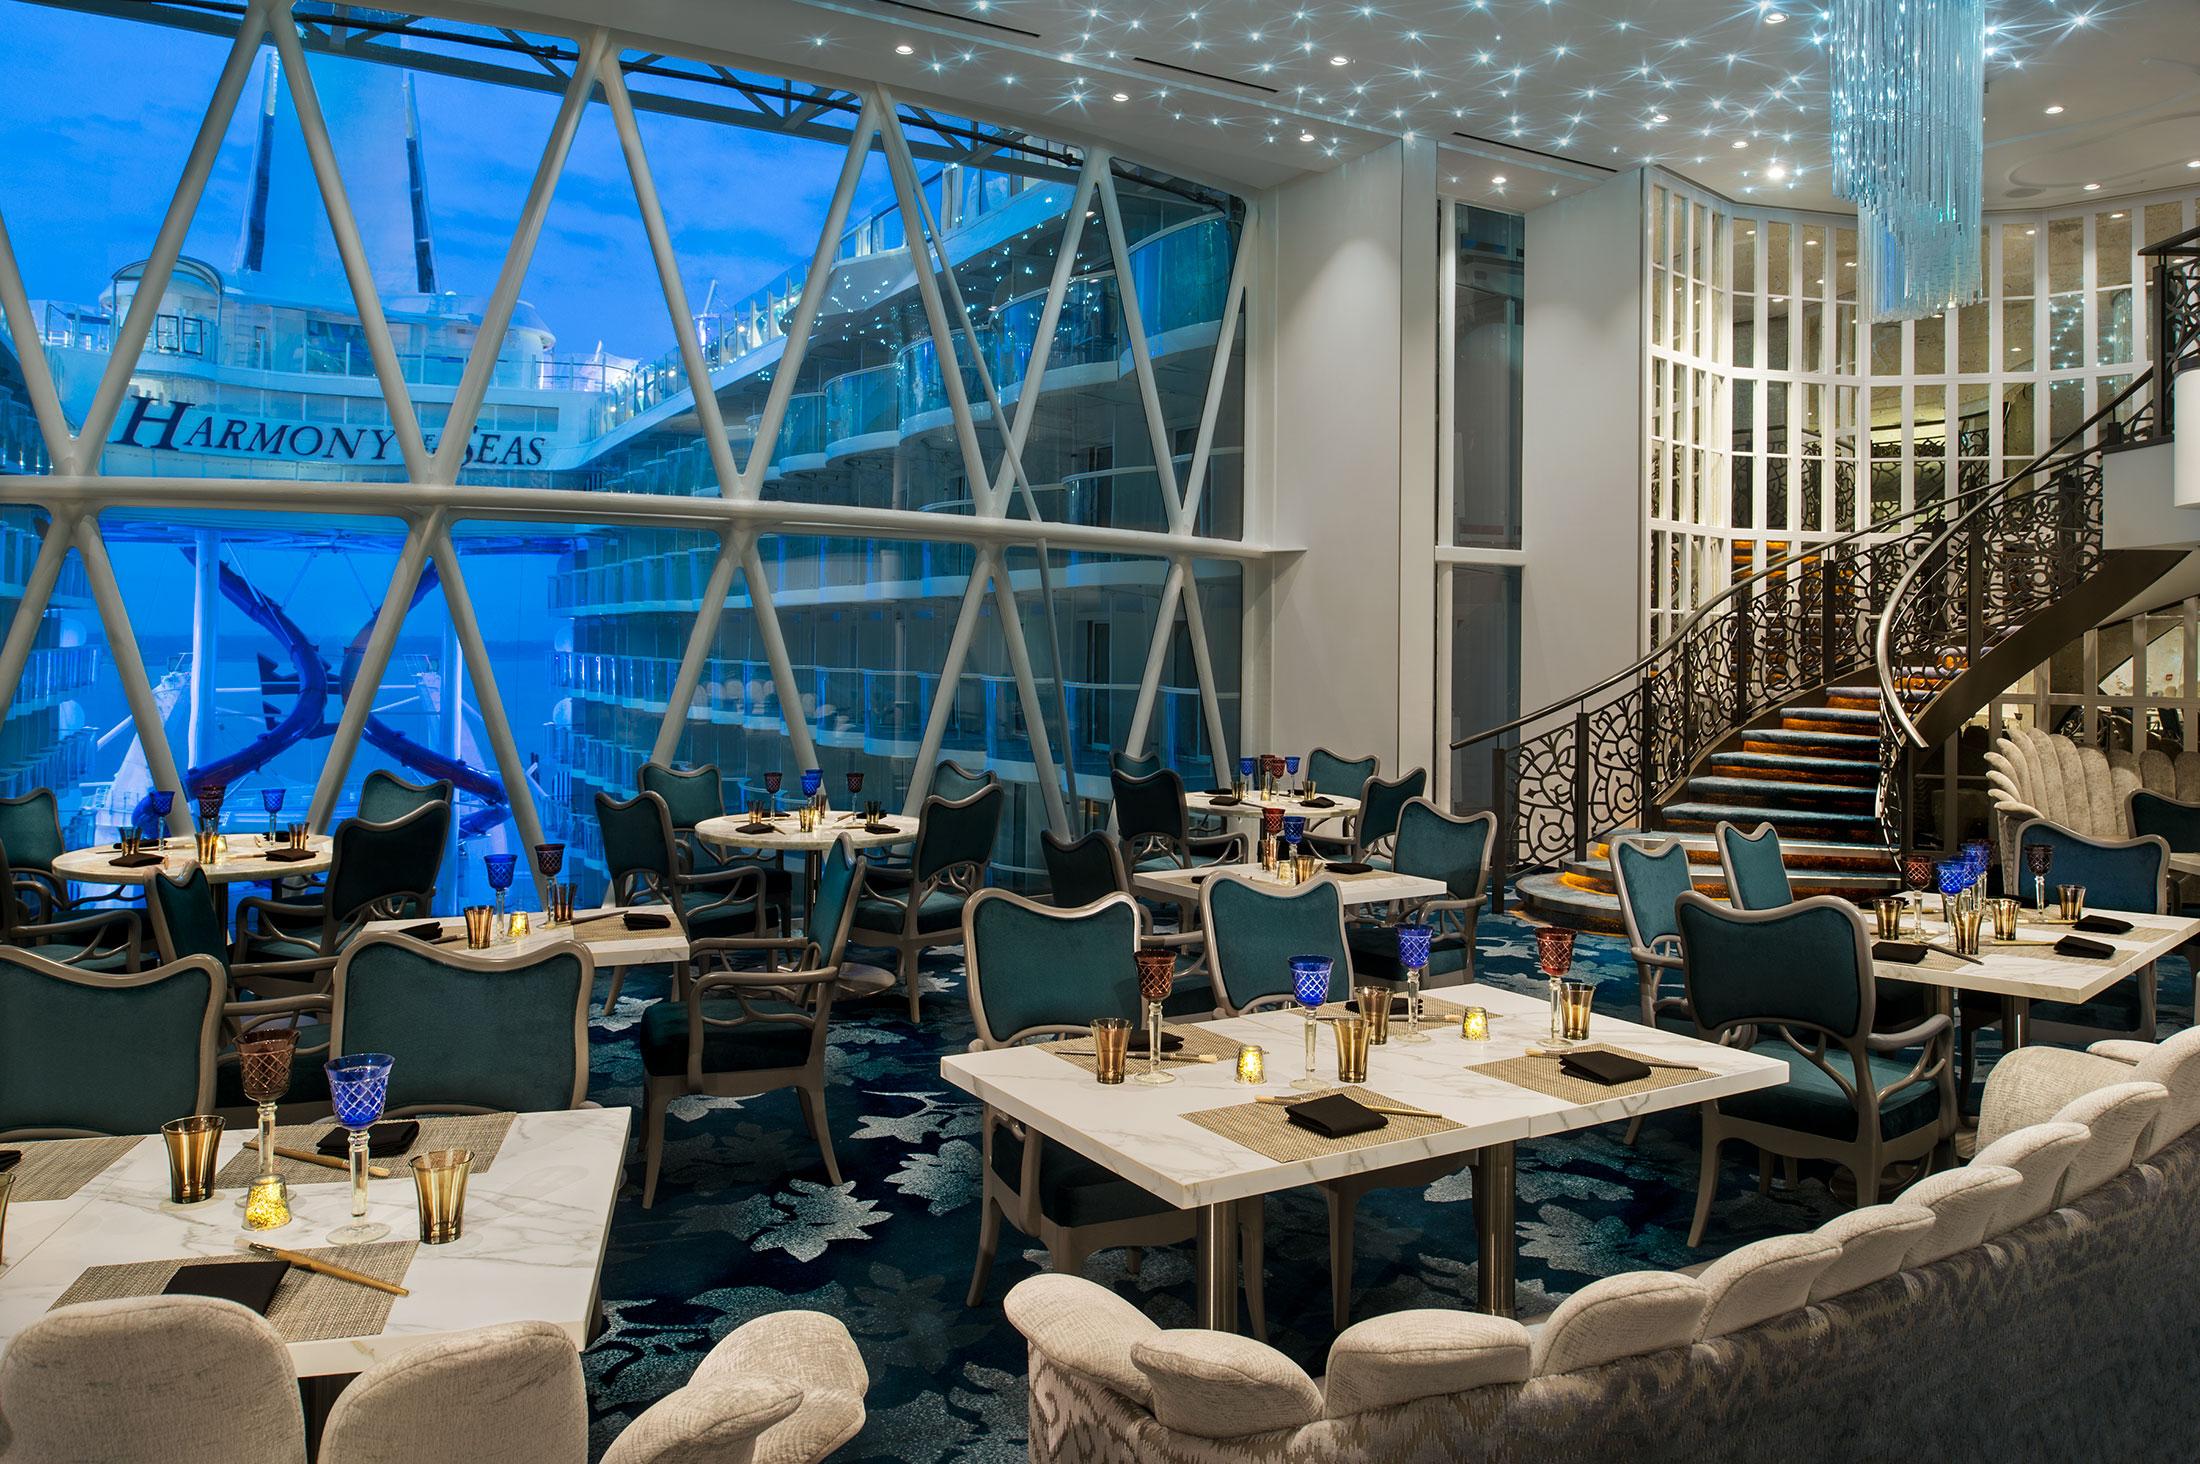 Dining harmony of the seas - Harmony of the seas interior rooms ...